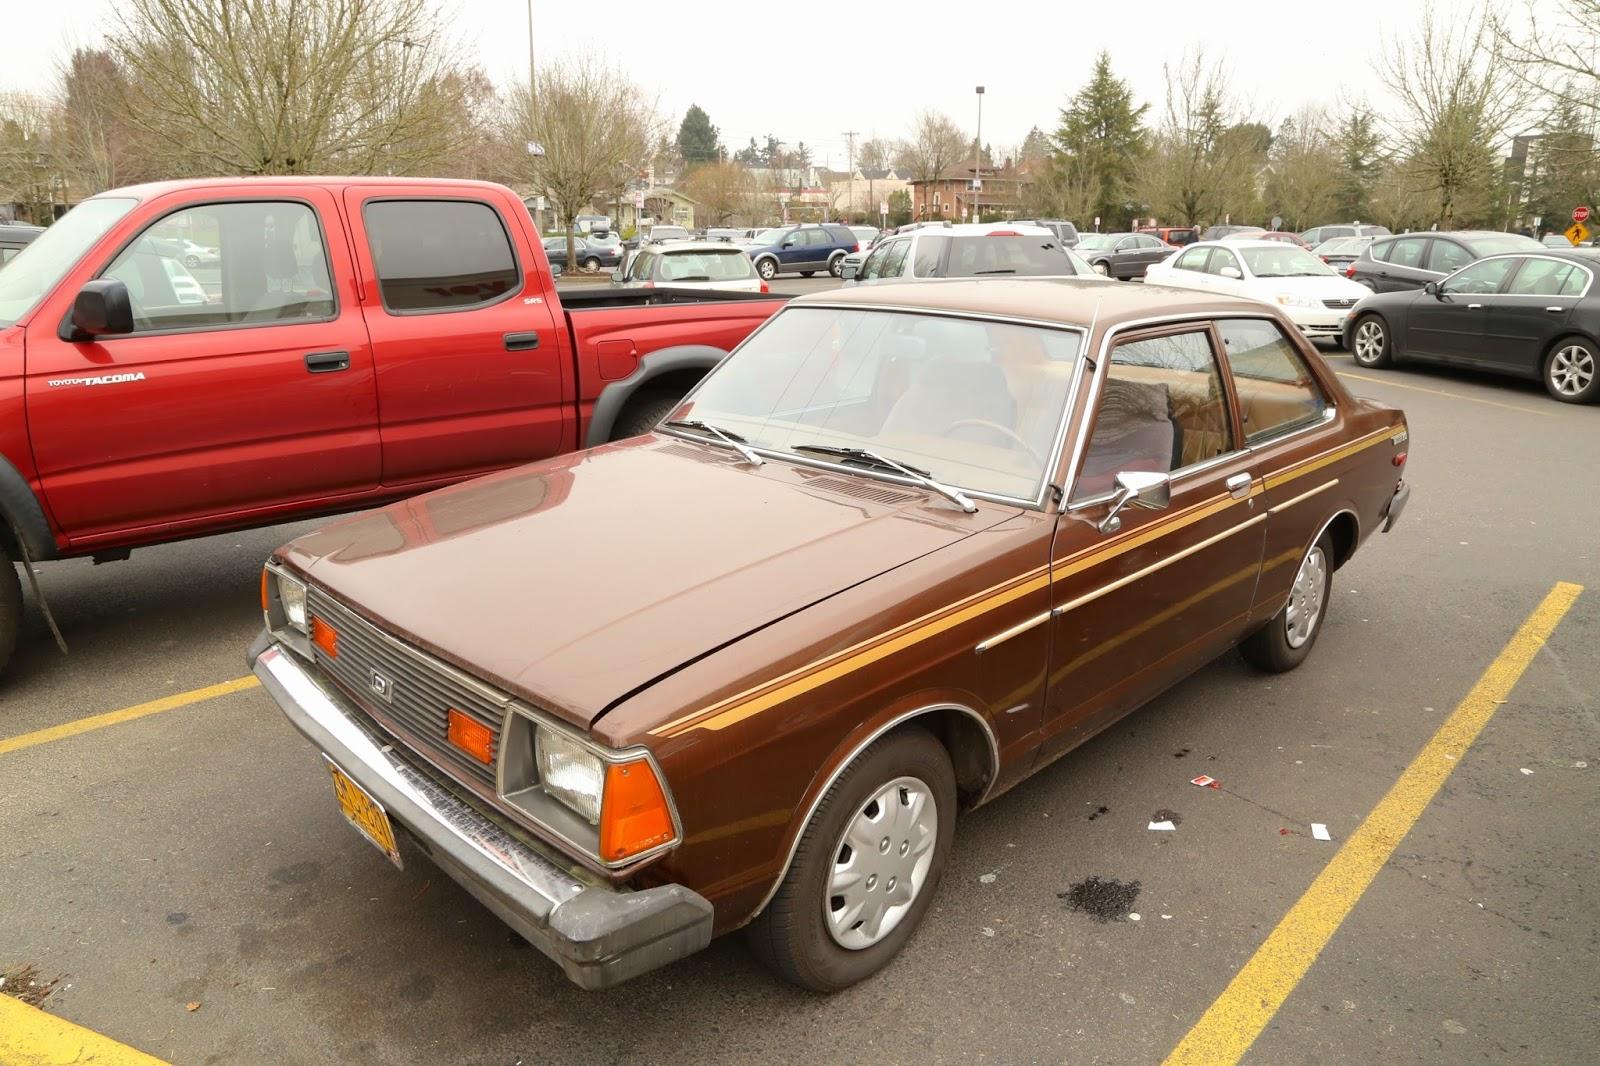 1981 Datsun 210 sedan